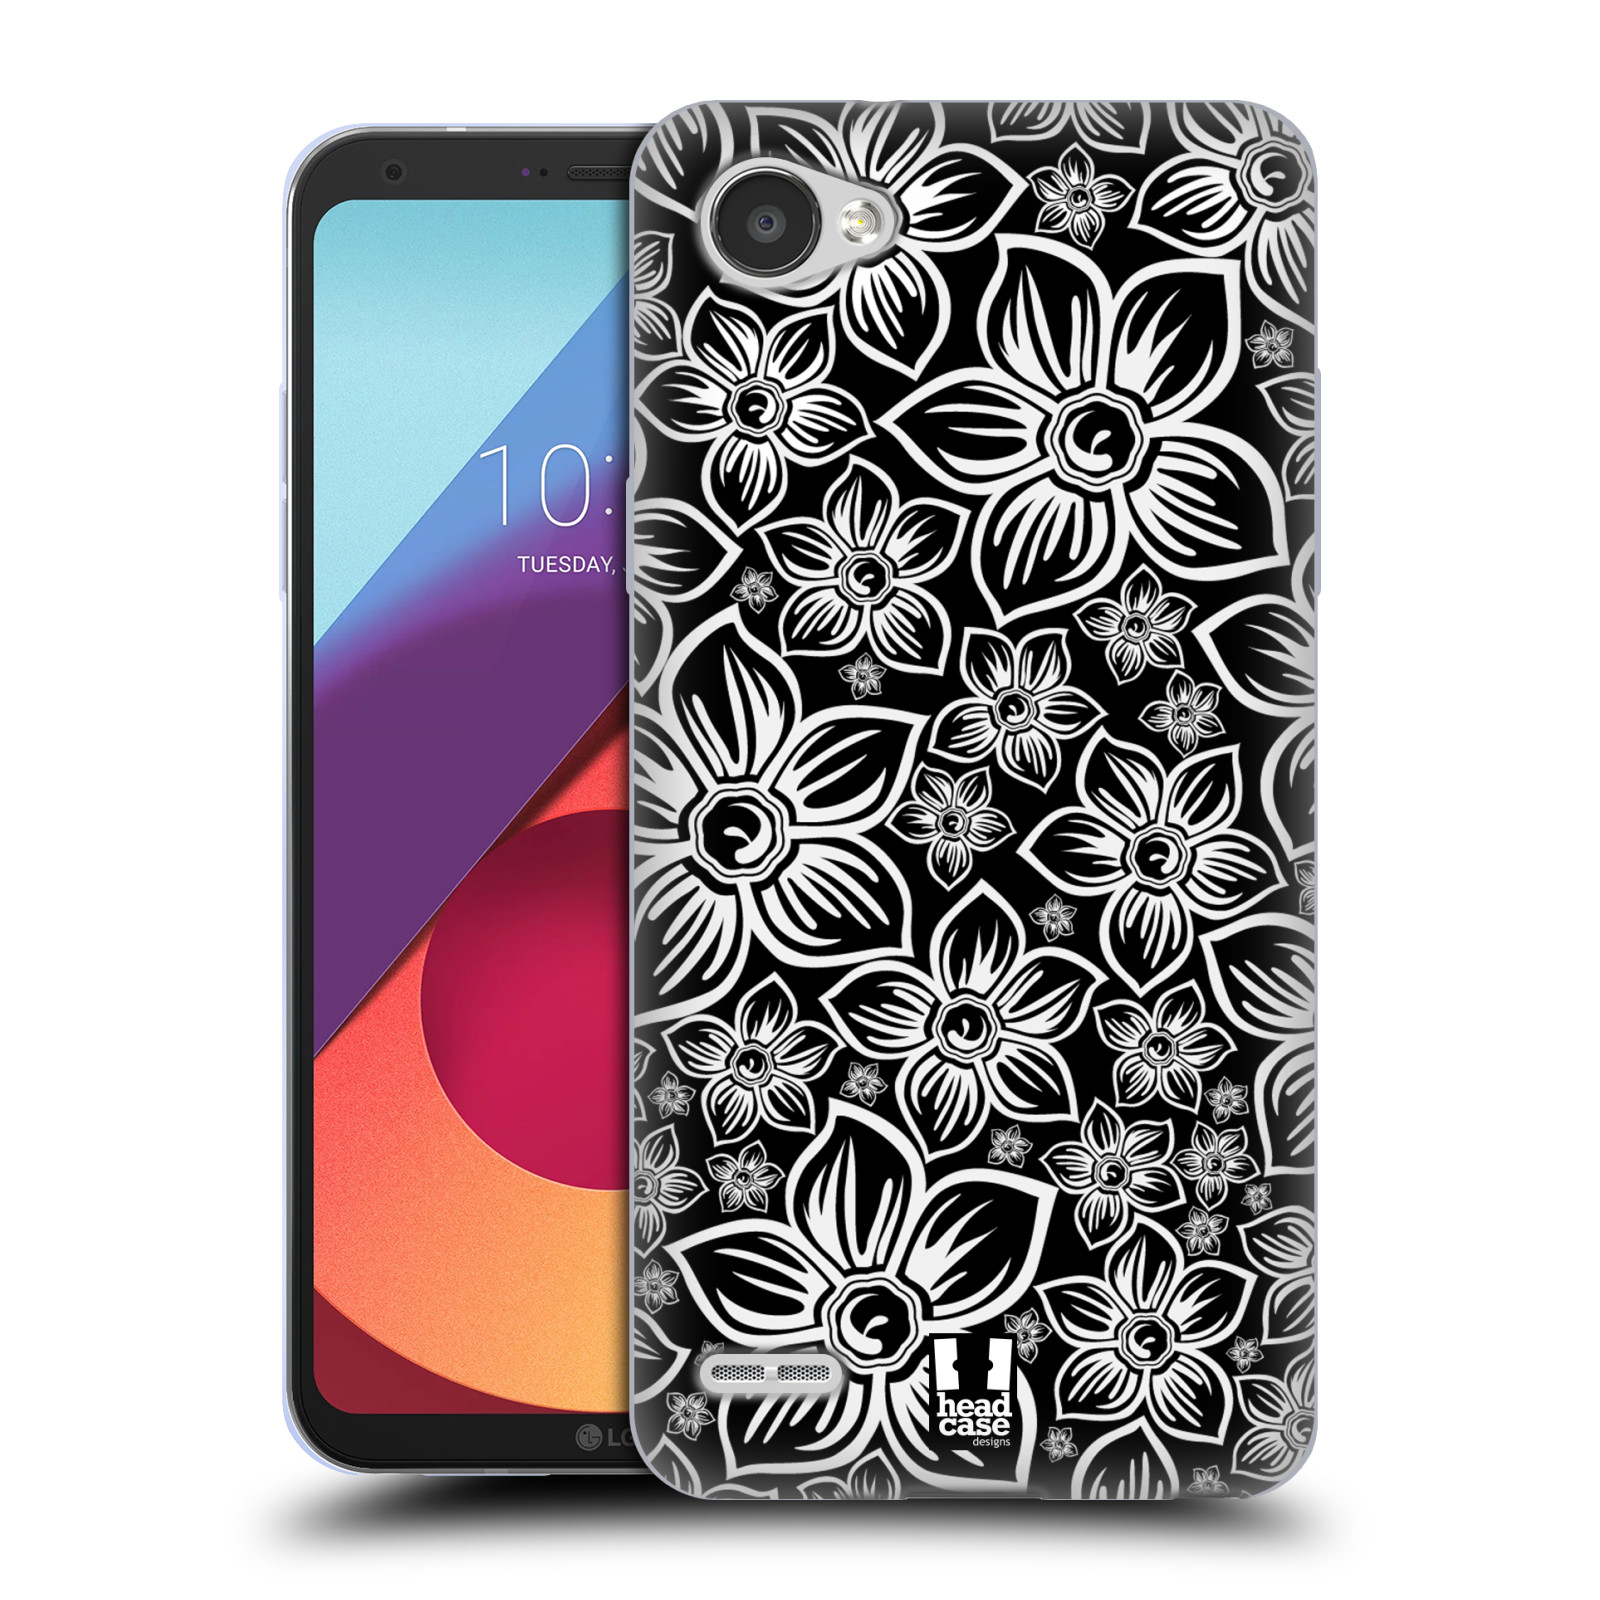 Silikonové pouzdro na mobil LG Q6 - Head Case - FLORAL DAISY